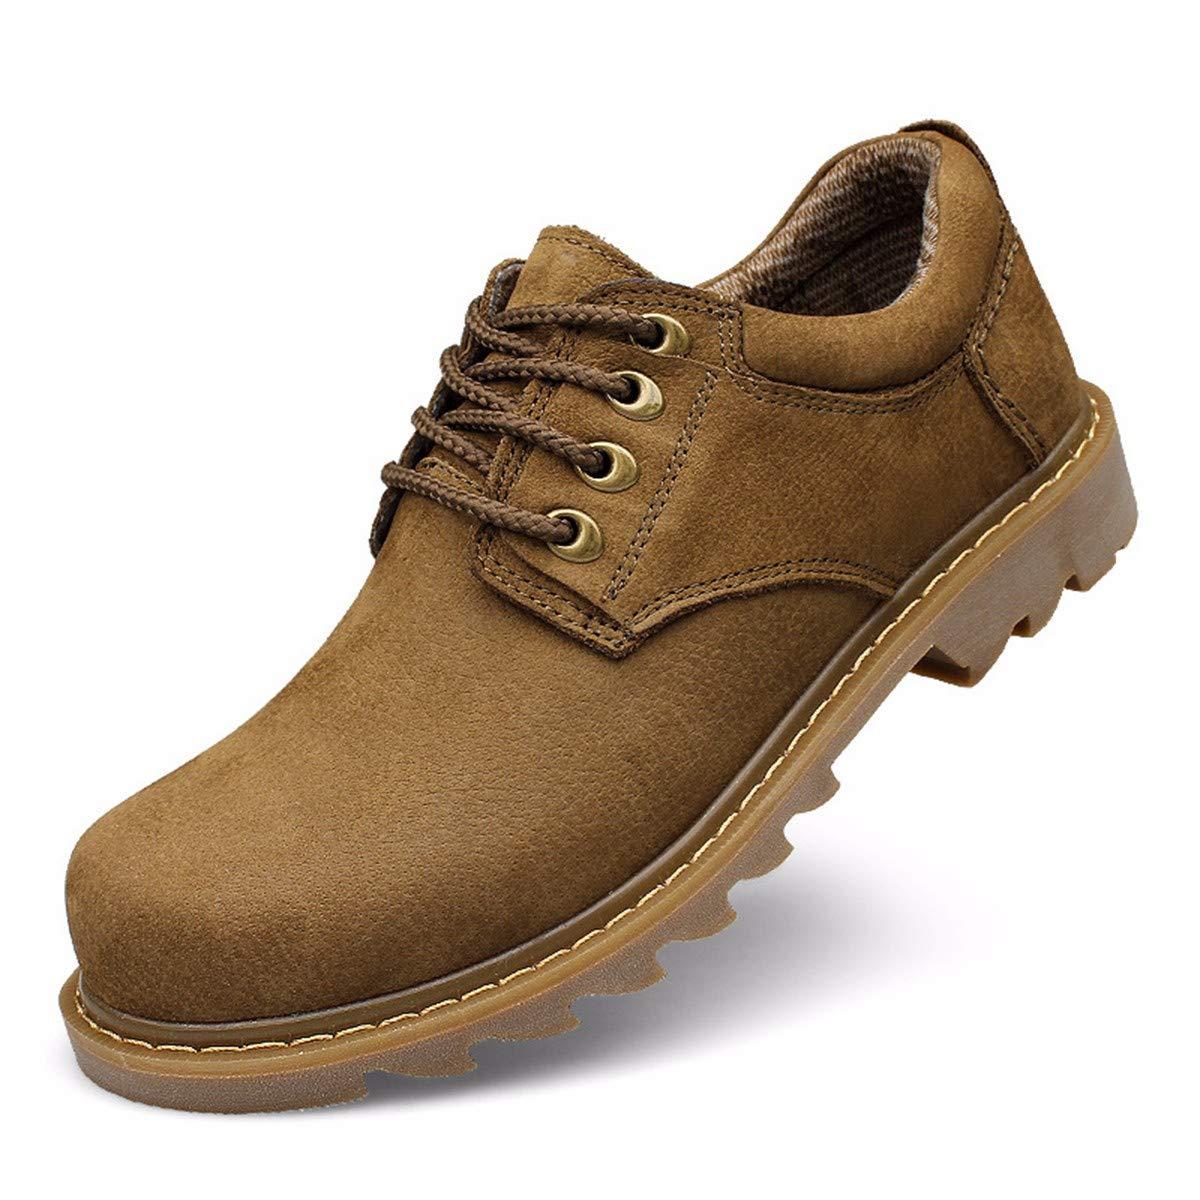 KMJBS Herren Schuhe Outdoor Casual Schuhe Frenulum Werkzeugschuhe Low Side Big schuhe Frosted Skin